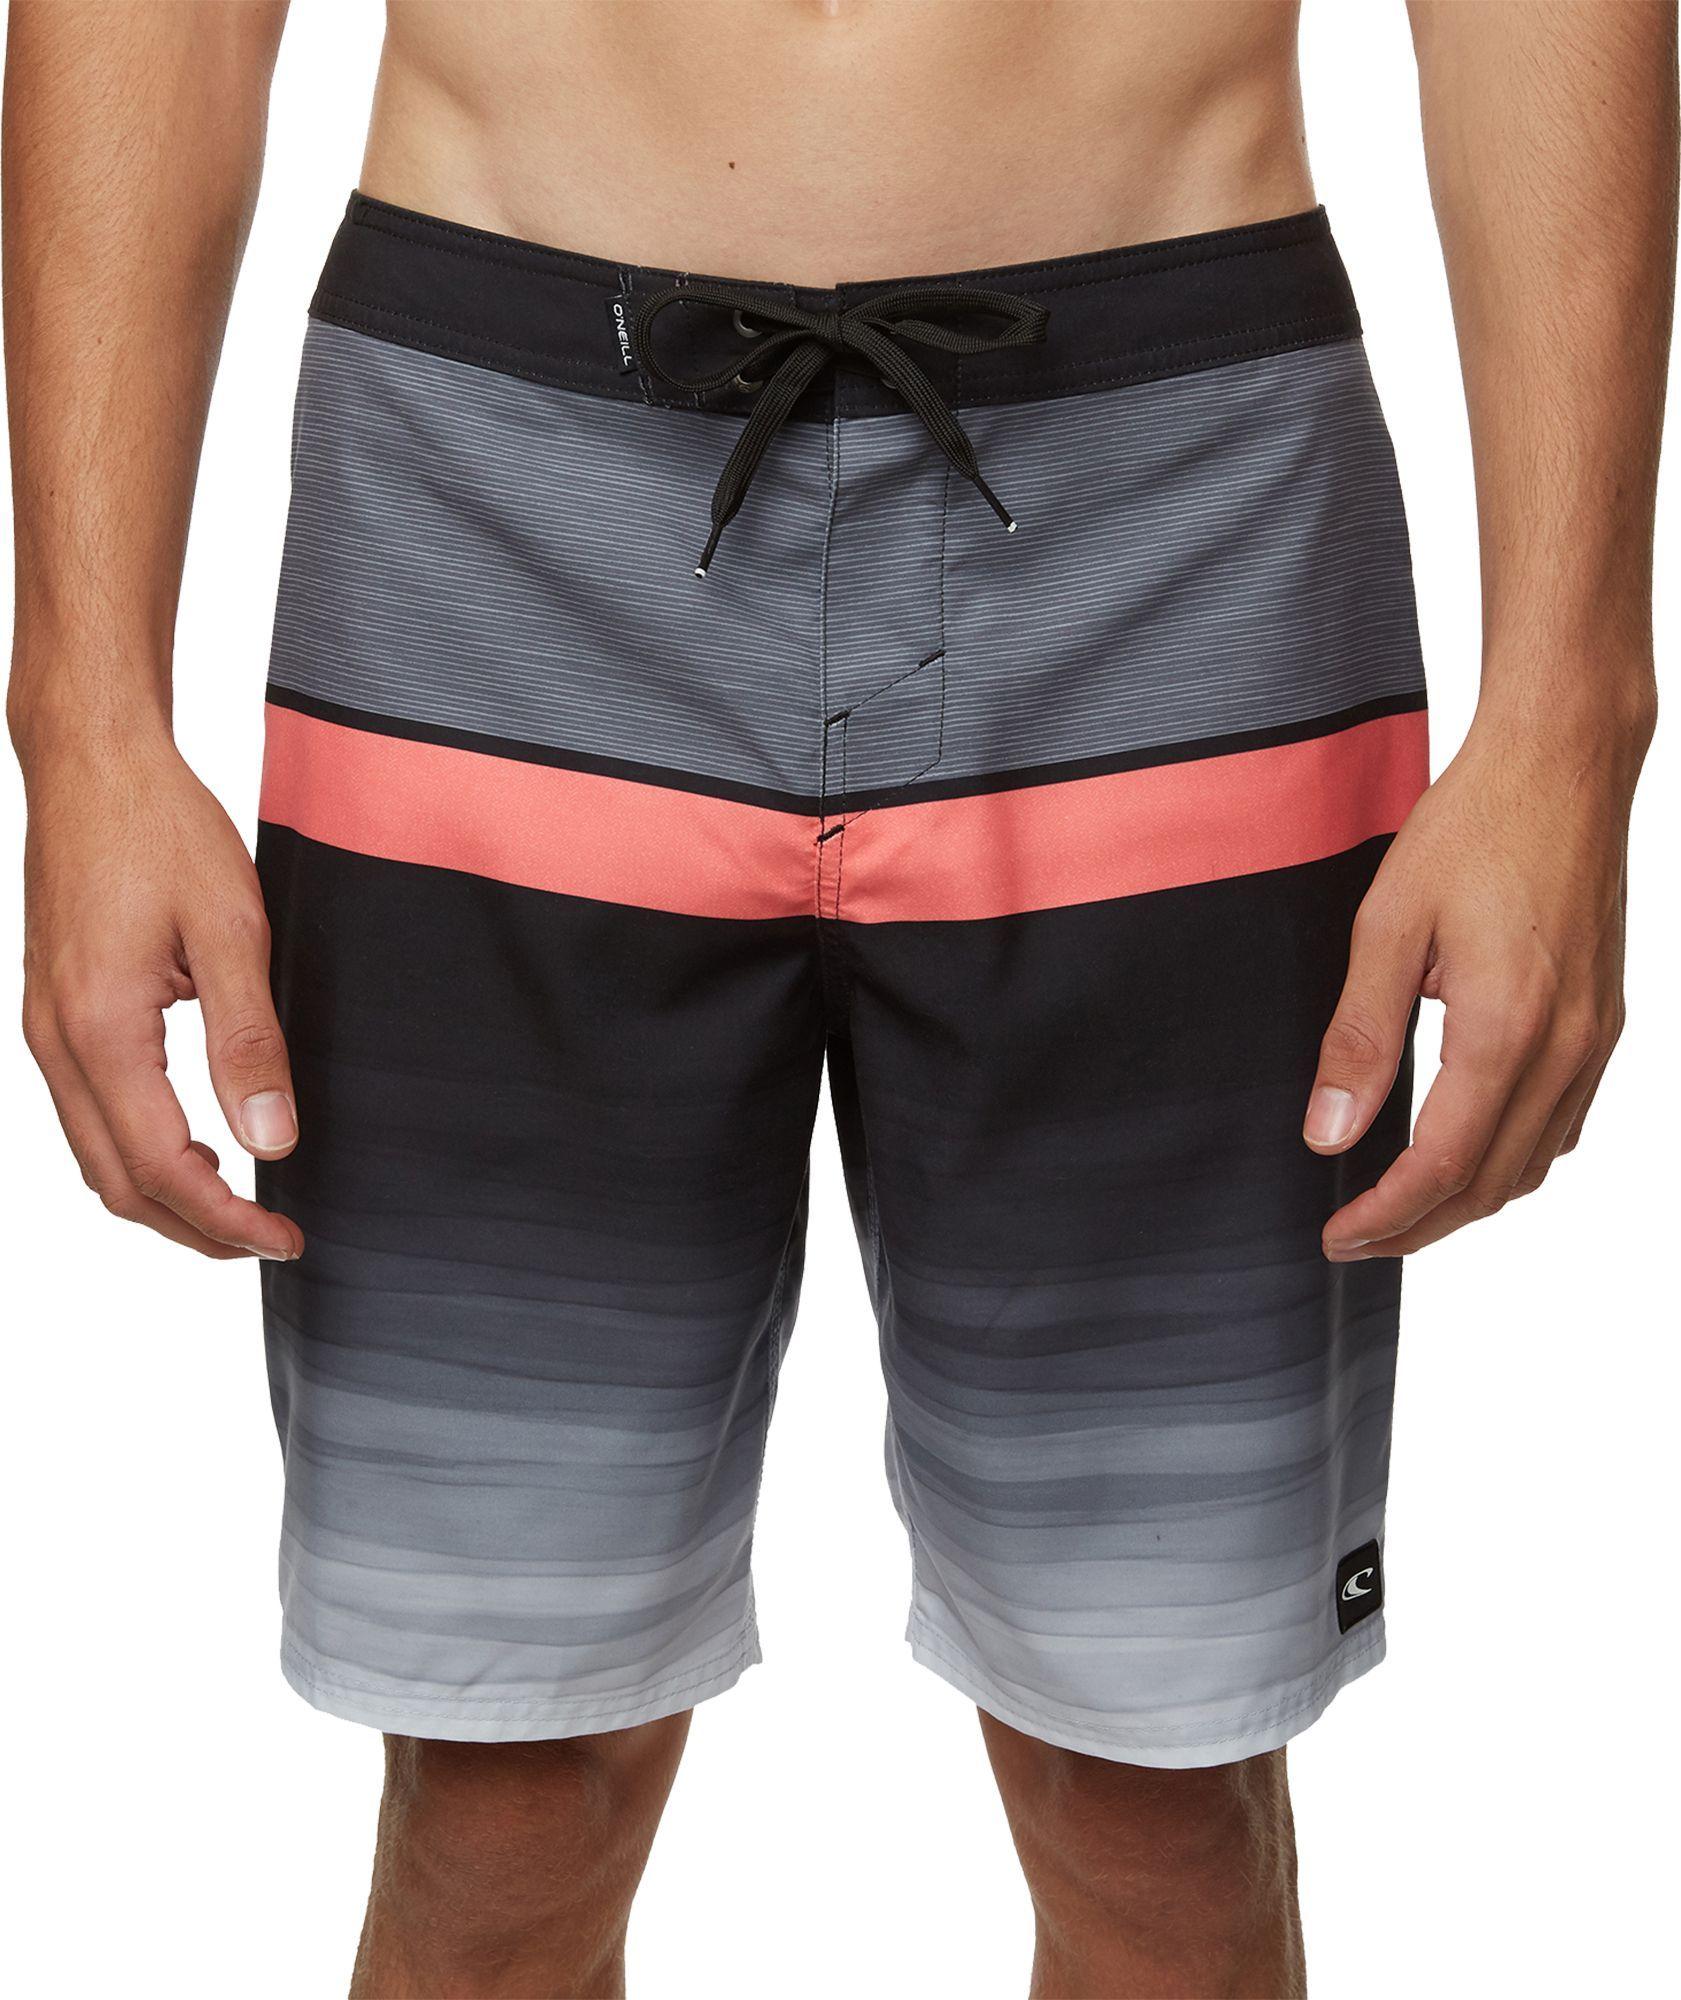 7e1668938f O'Neill Men's Rip Tide Board Shorts in 2019 | Products | Shorts ...